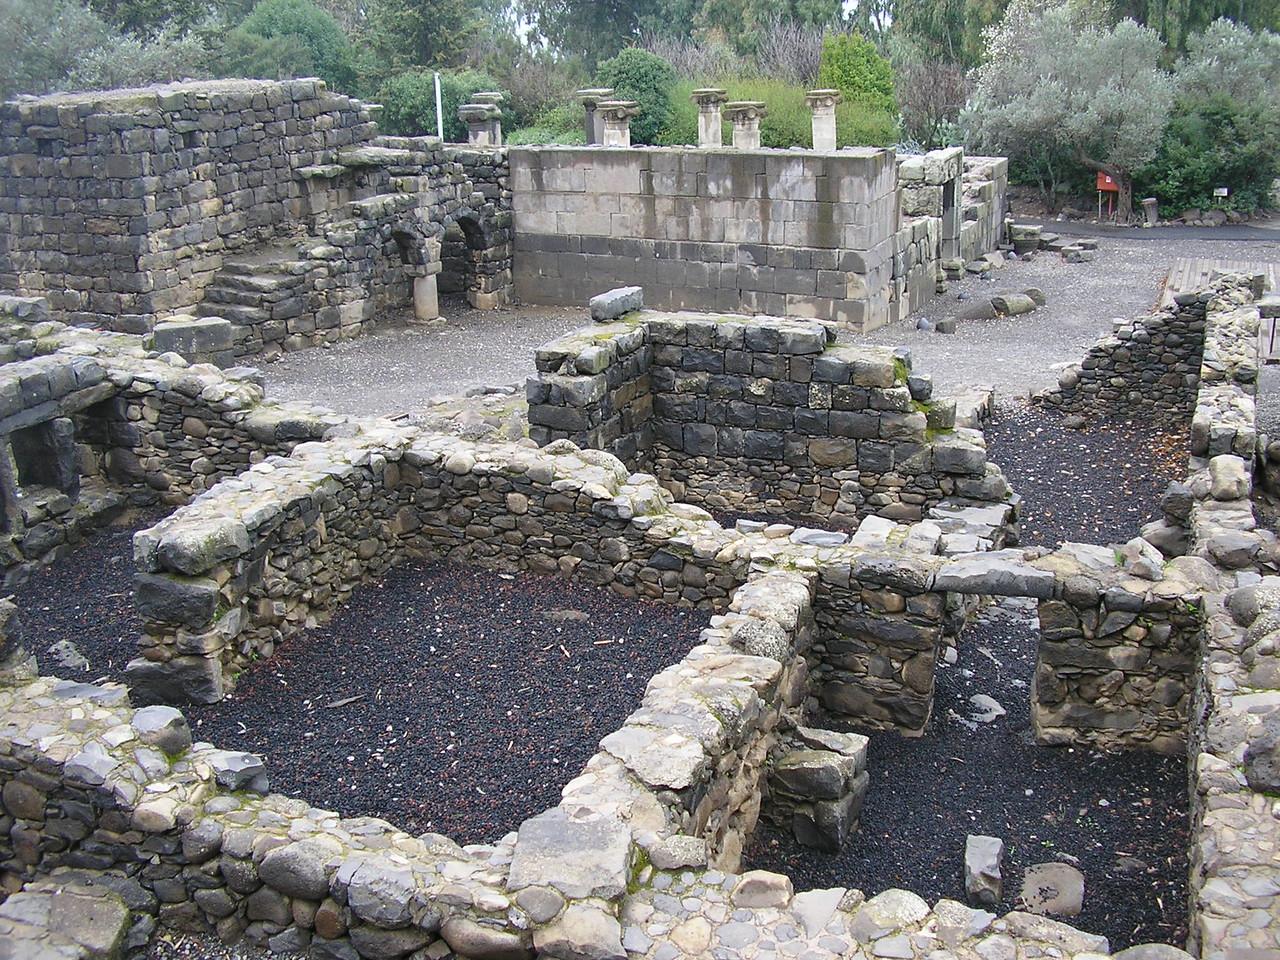 Katzrin Ancient Village and Synagogue Foundations and Walls